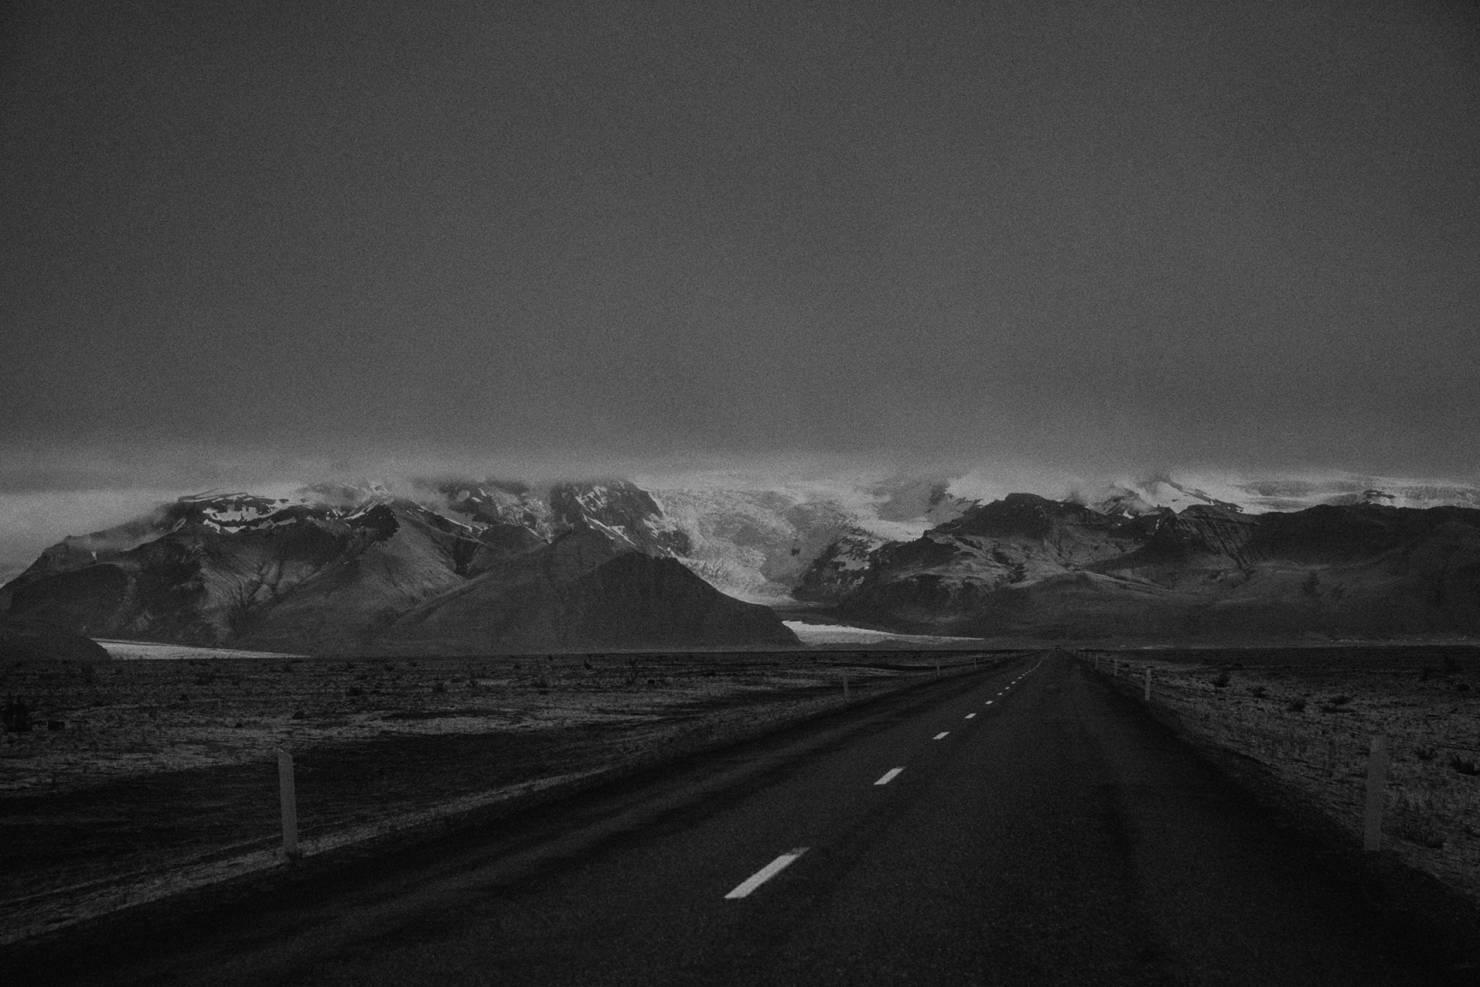 patrick_schuttler_landscape_iceland_003-ce25e298a94a94c83411f8e624e39518